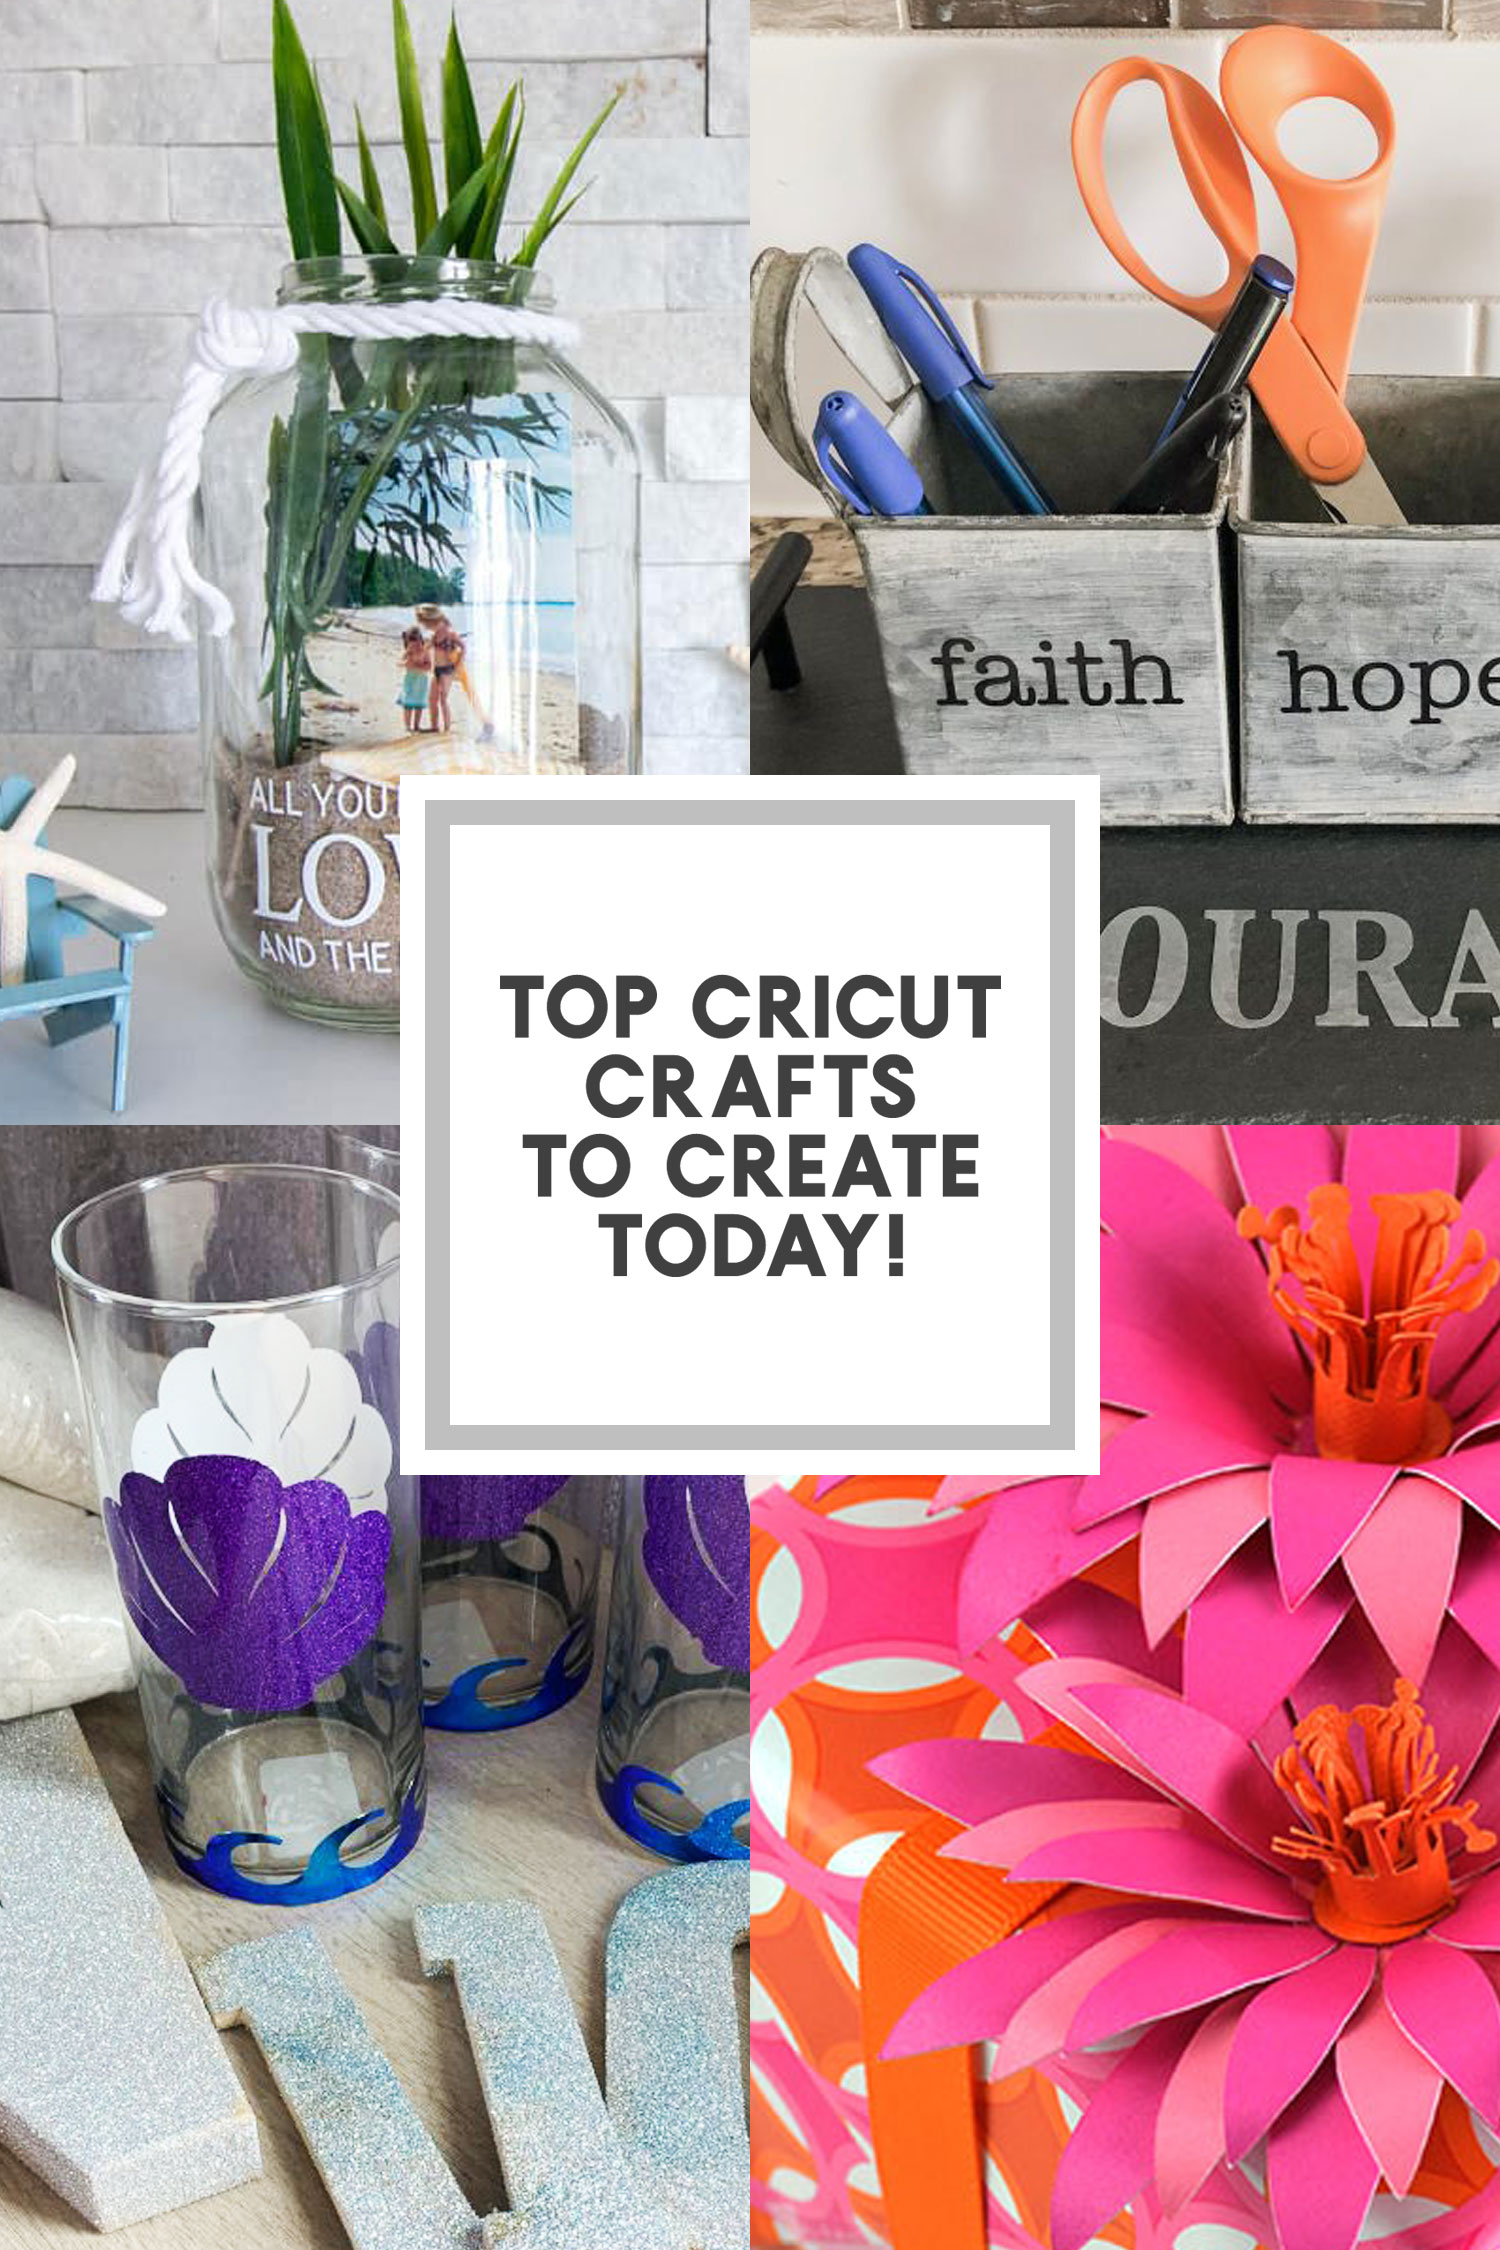 recreate cricut crafts